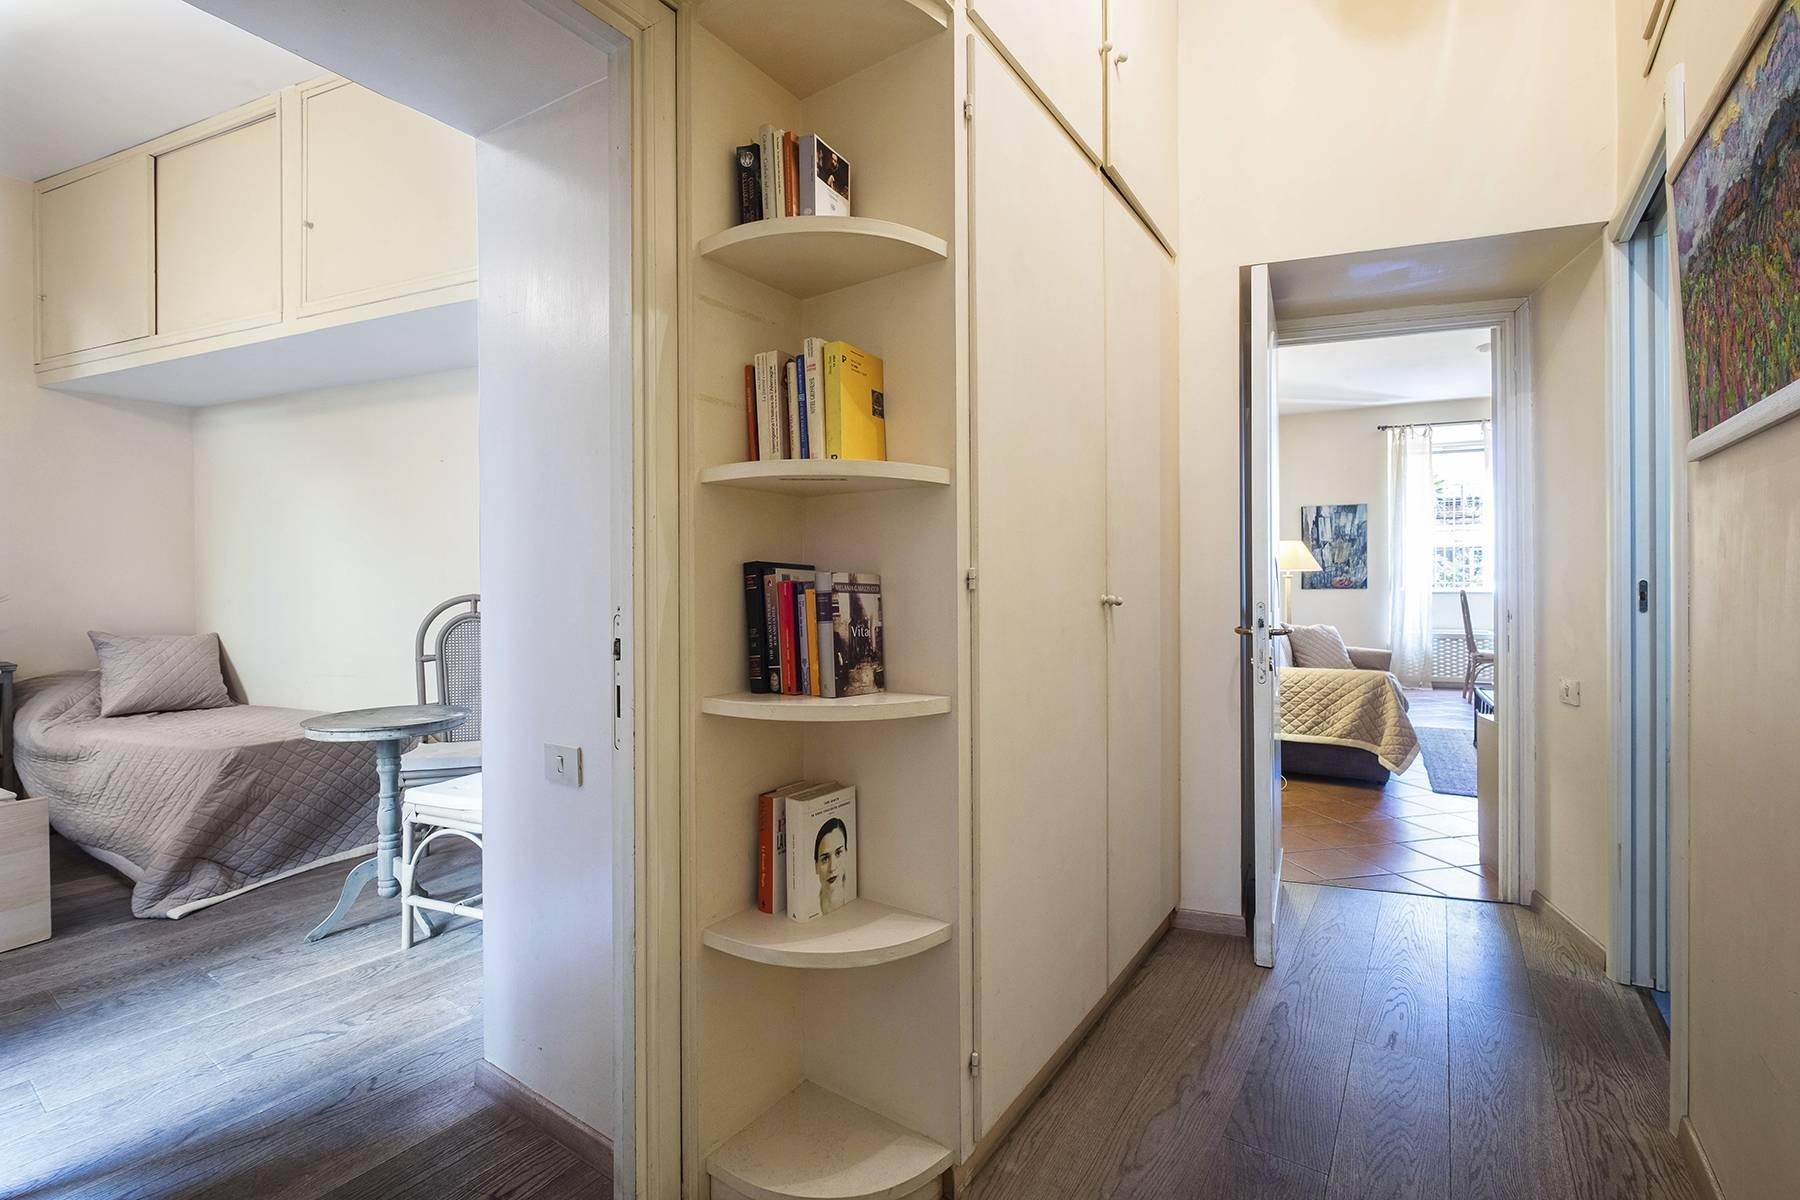 Affascinante appartamento a due passi dal Palatino - 13